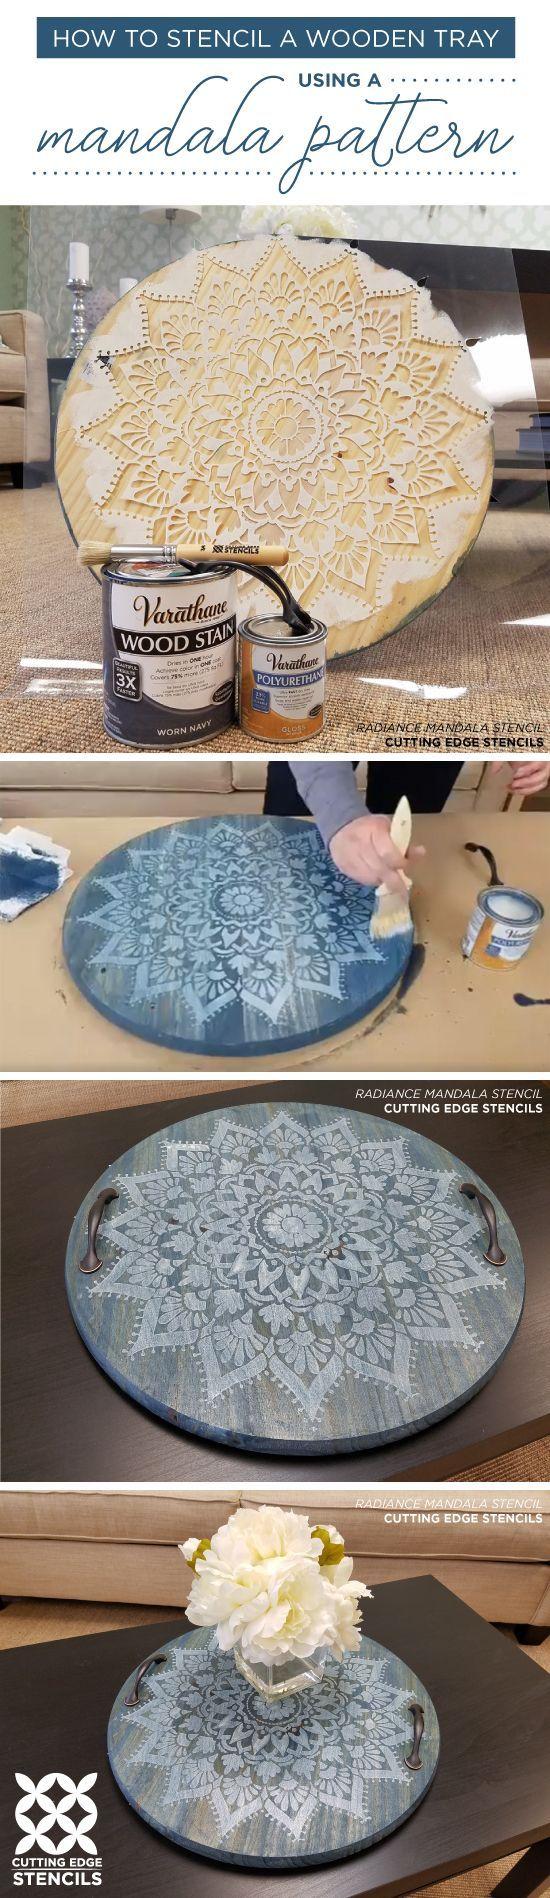 Cutting Edge Stencils shares how to craft a DIY wooden tray using the Radiance Mandala Stencil. http://www.cuttingedgestencils.com/prosperity-mandala-stencil-yoga-mandala-stencils-designs.html